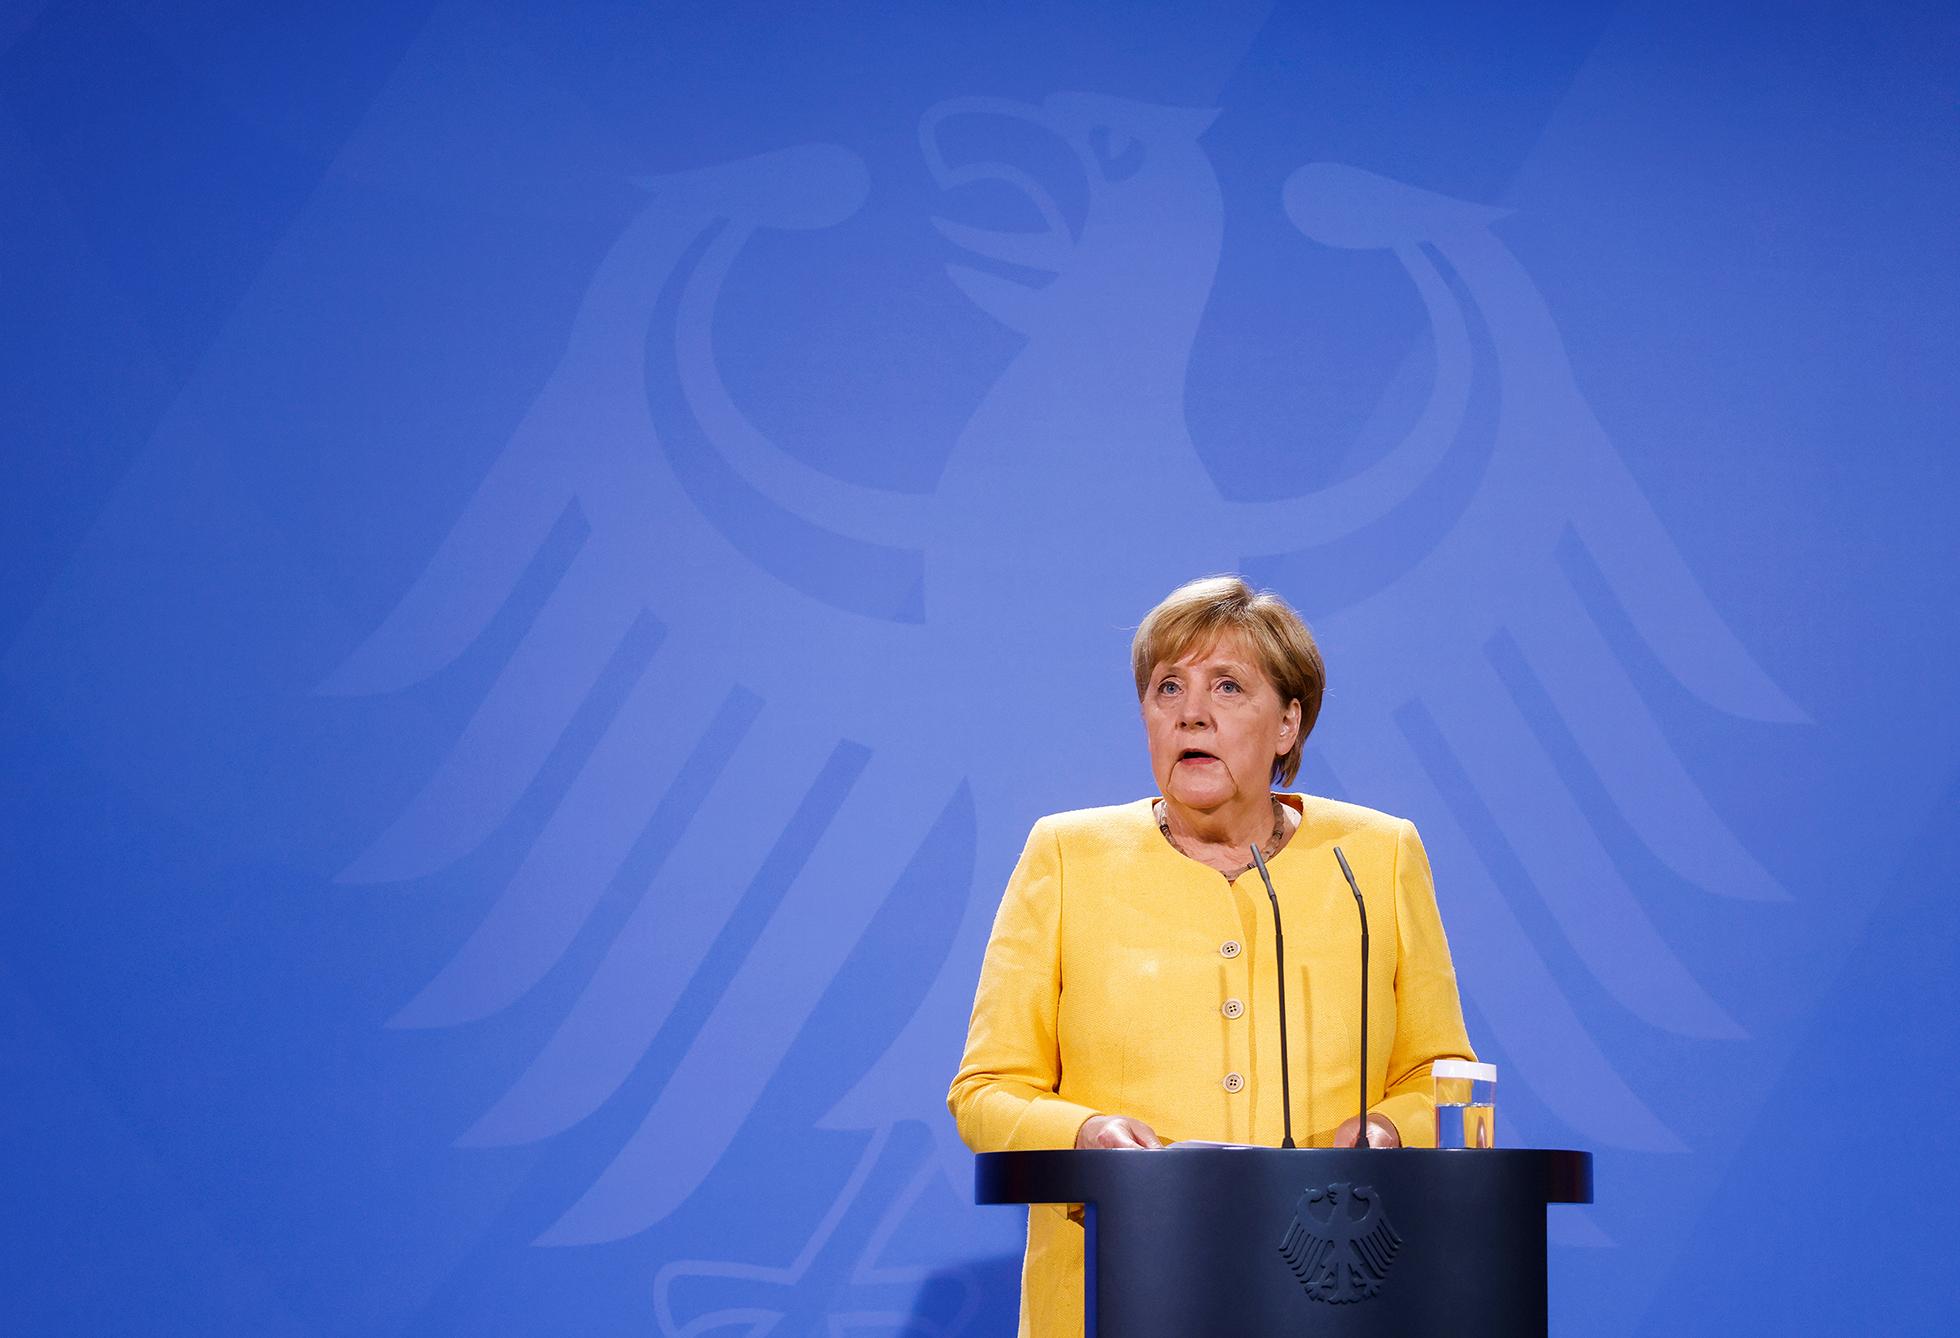 Analysis-Red tape, risk aversion clip wings of Merkel's innovation legacy